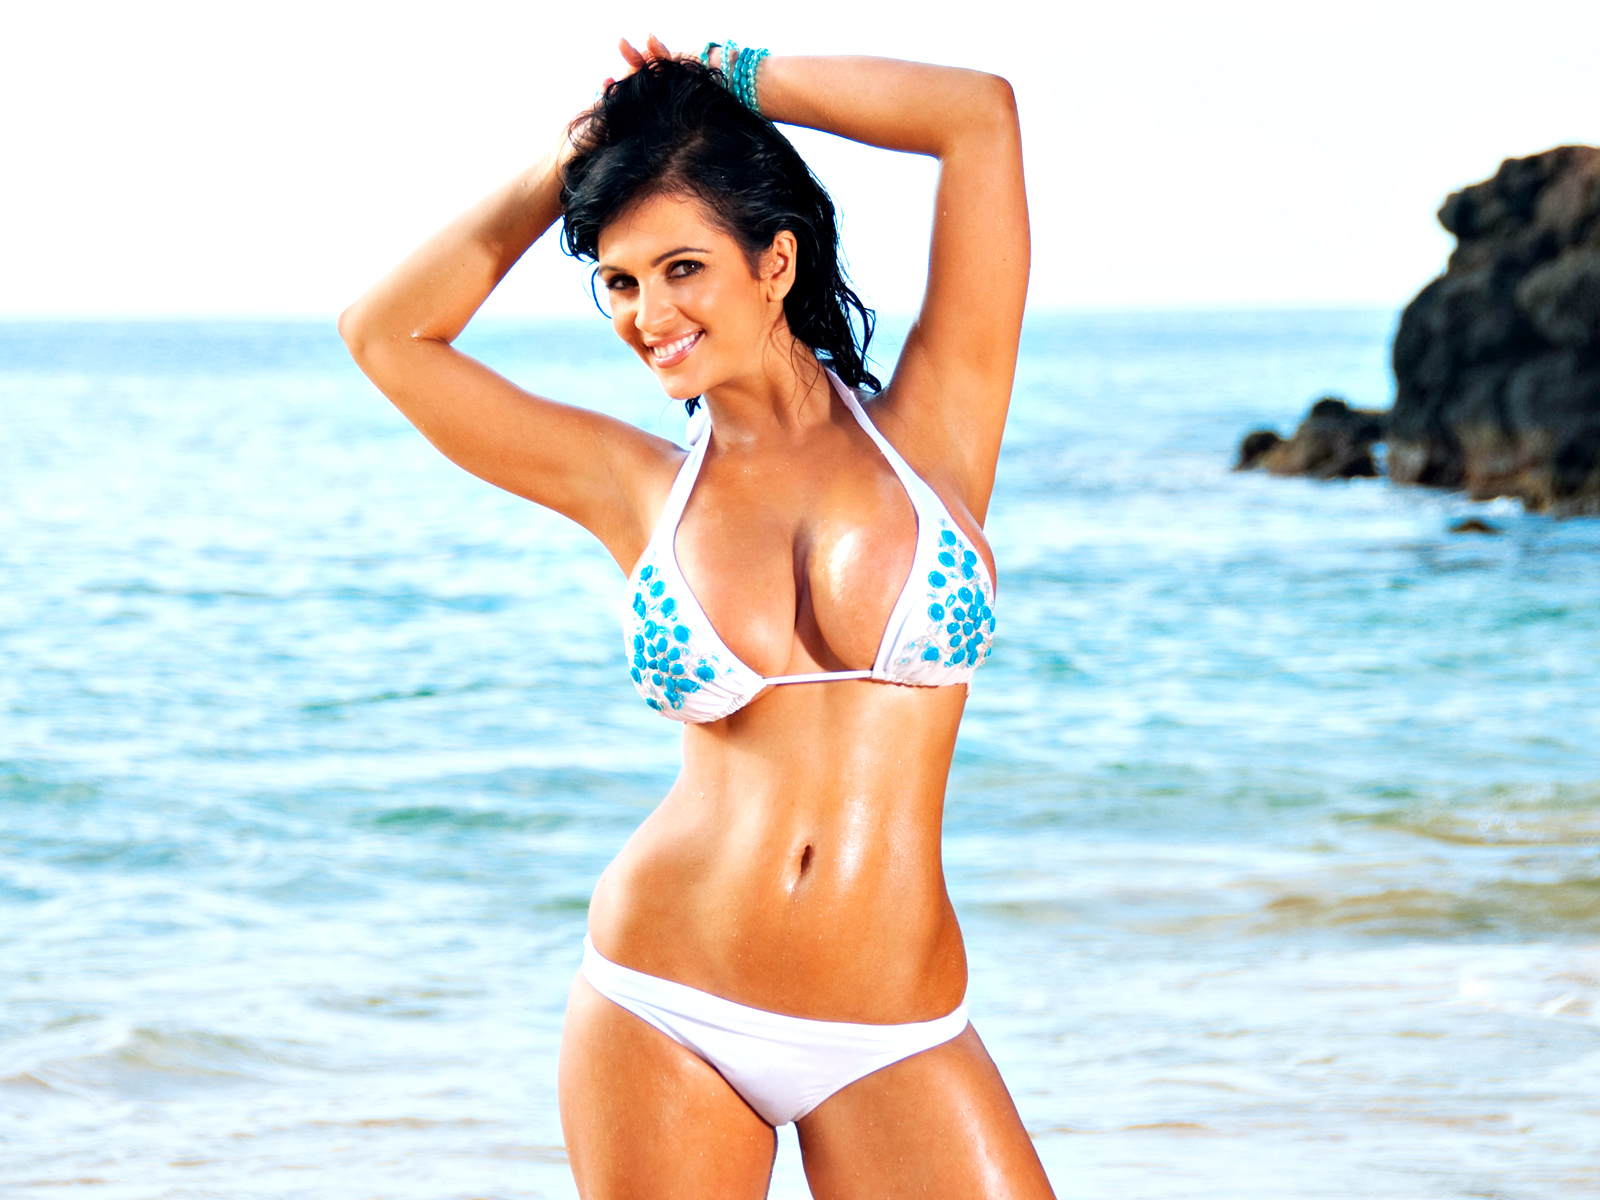 www mujeres en la playa com: